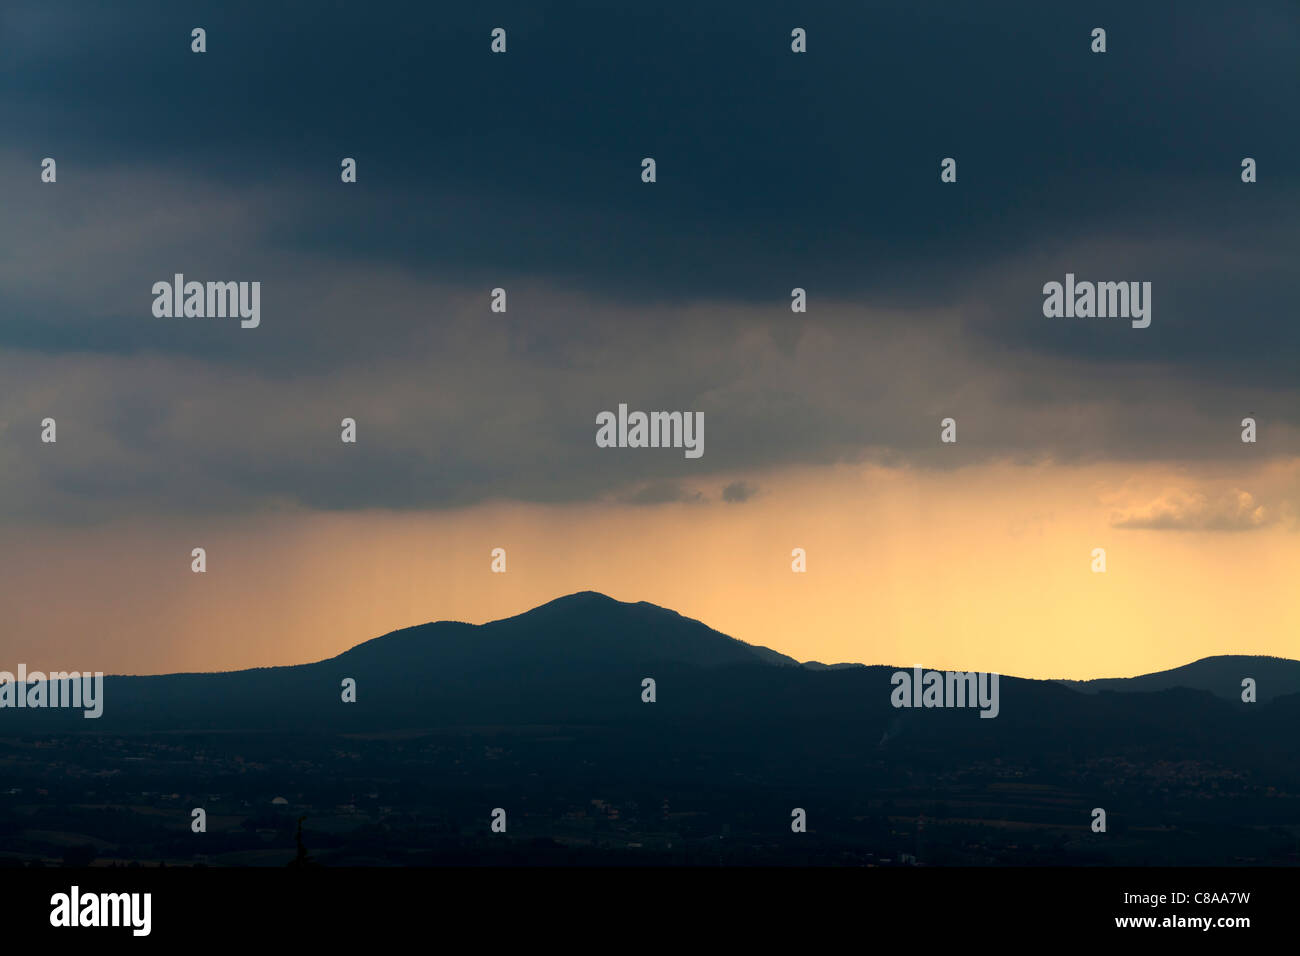 overcast dark sky with yellow glow beyond hills - Stock Image